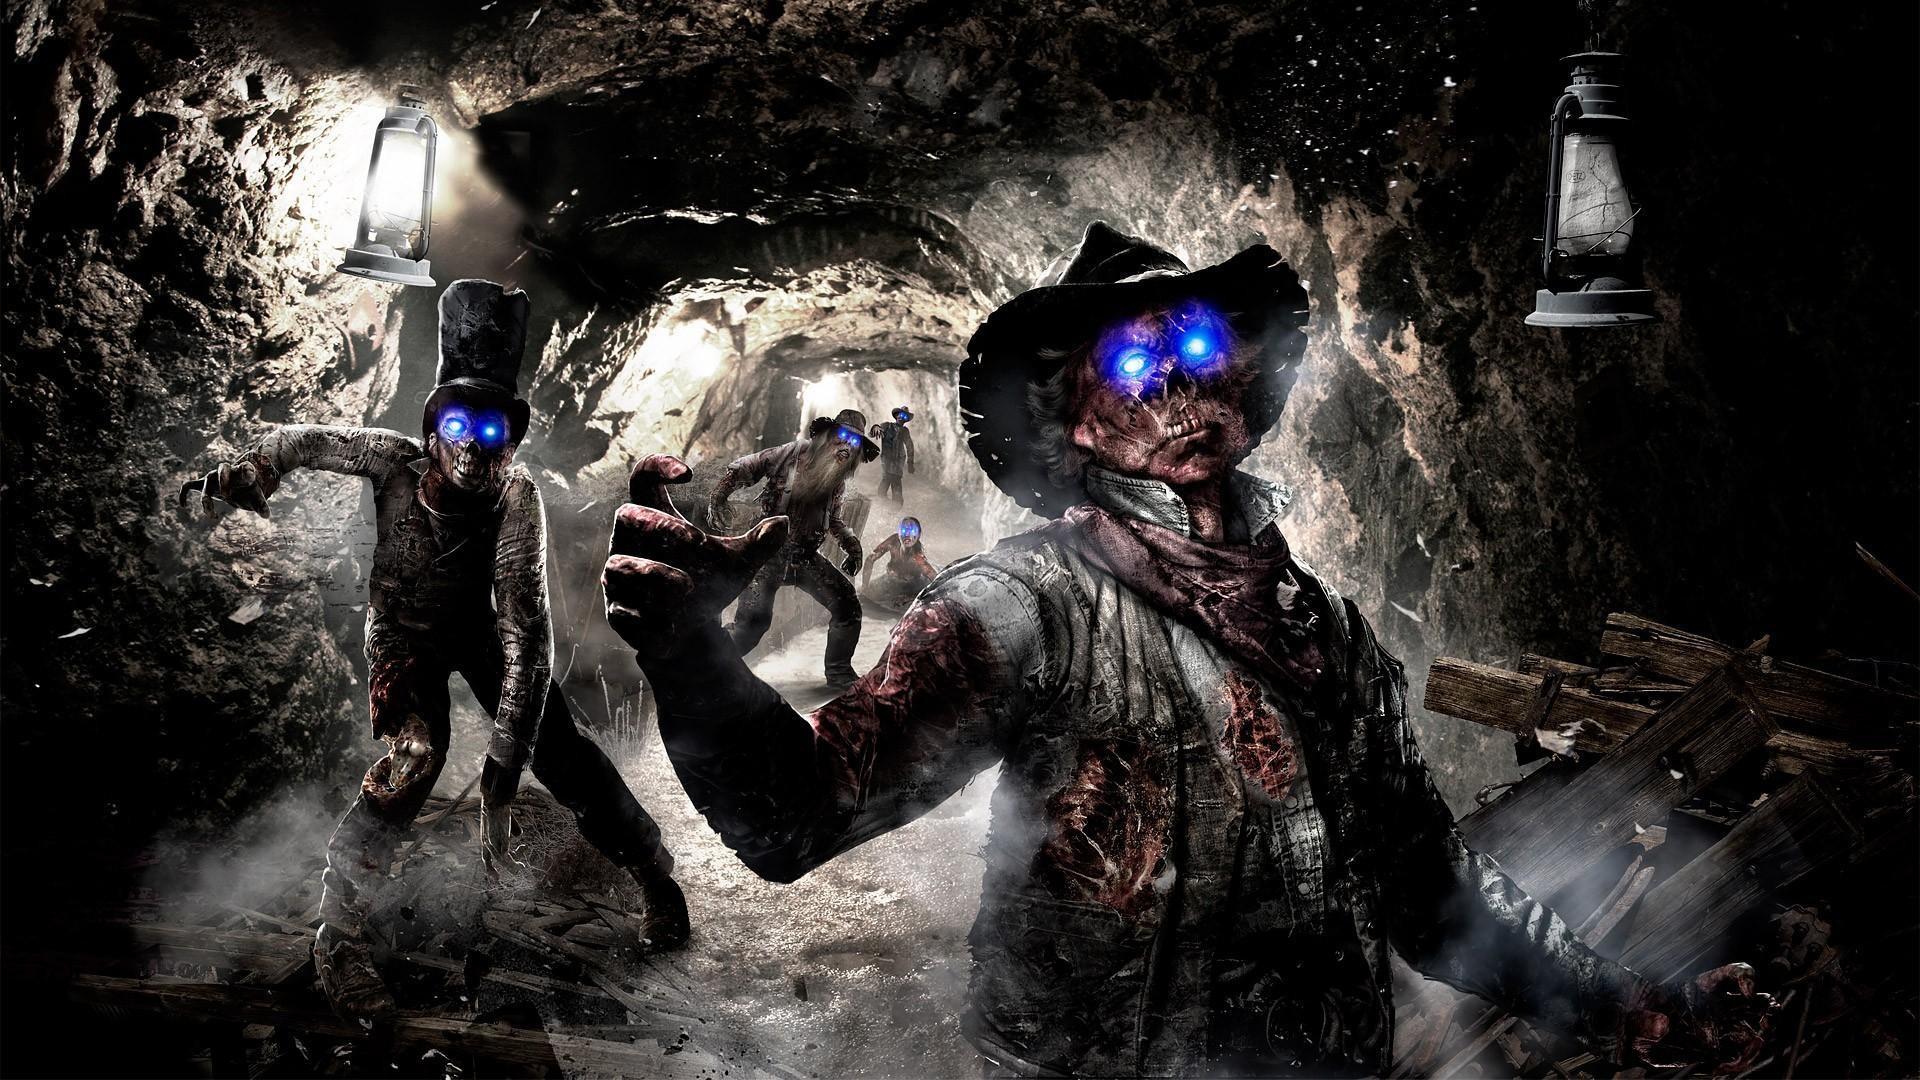 black ops 2 nuketown zombies wallpaper 1080pblack ops 2 zombies .